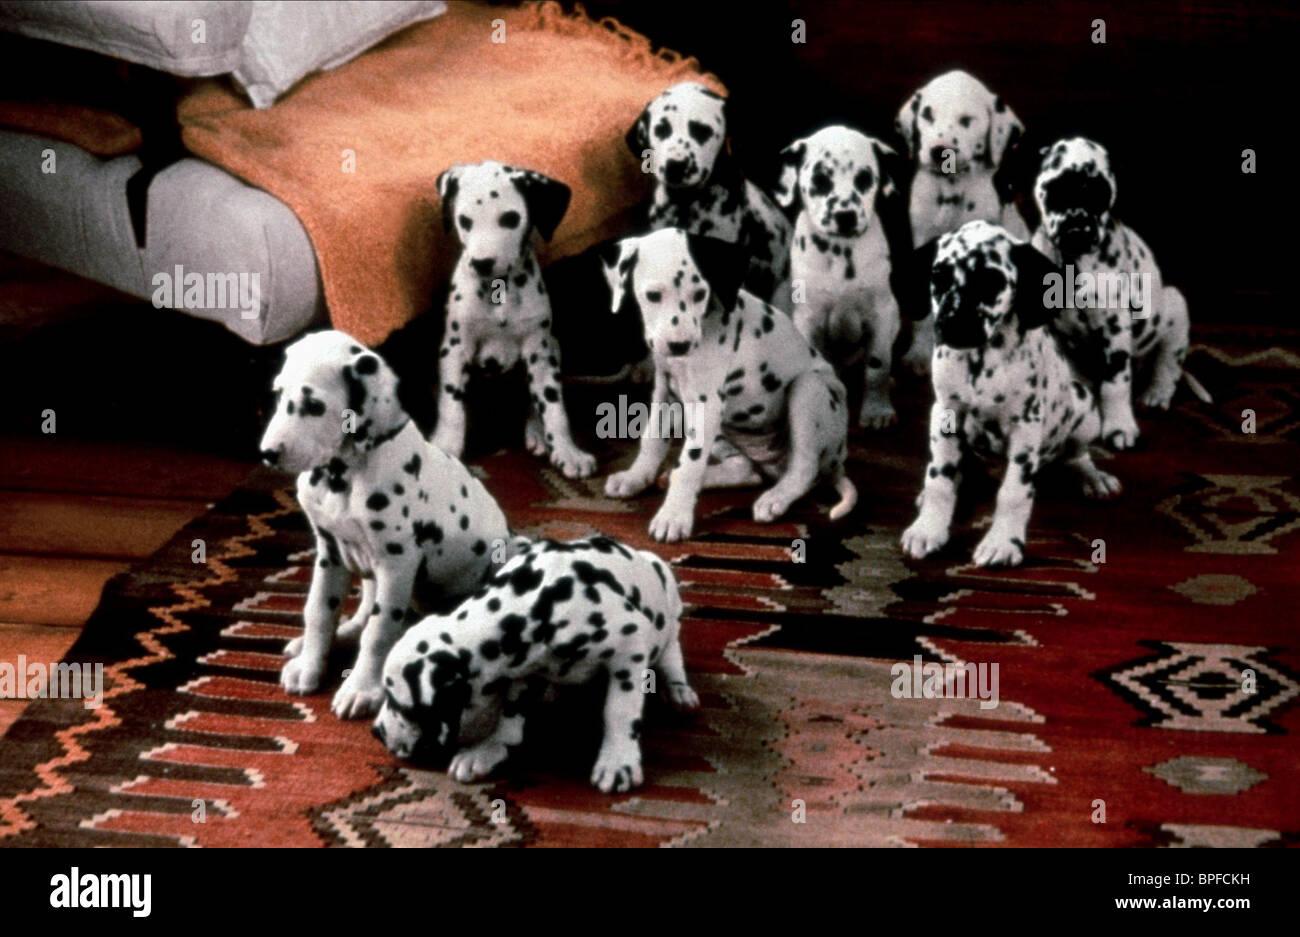 Dalmatian Puppies 101 Dalmatians 1996 Stock Photo Alamy